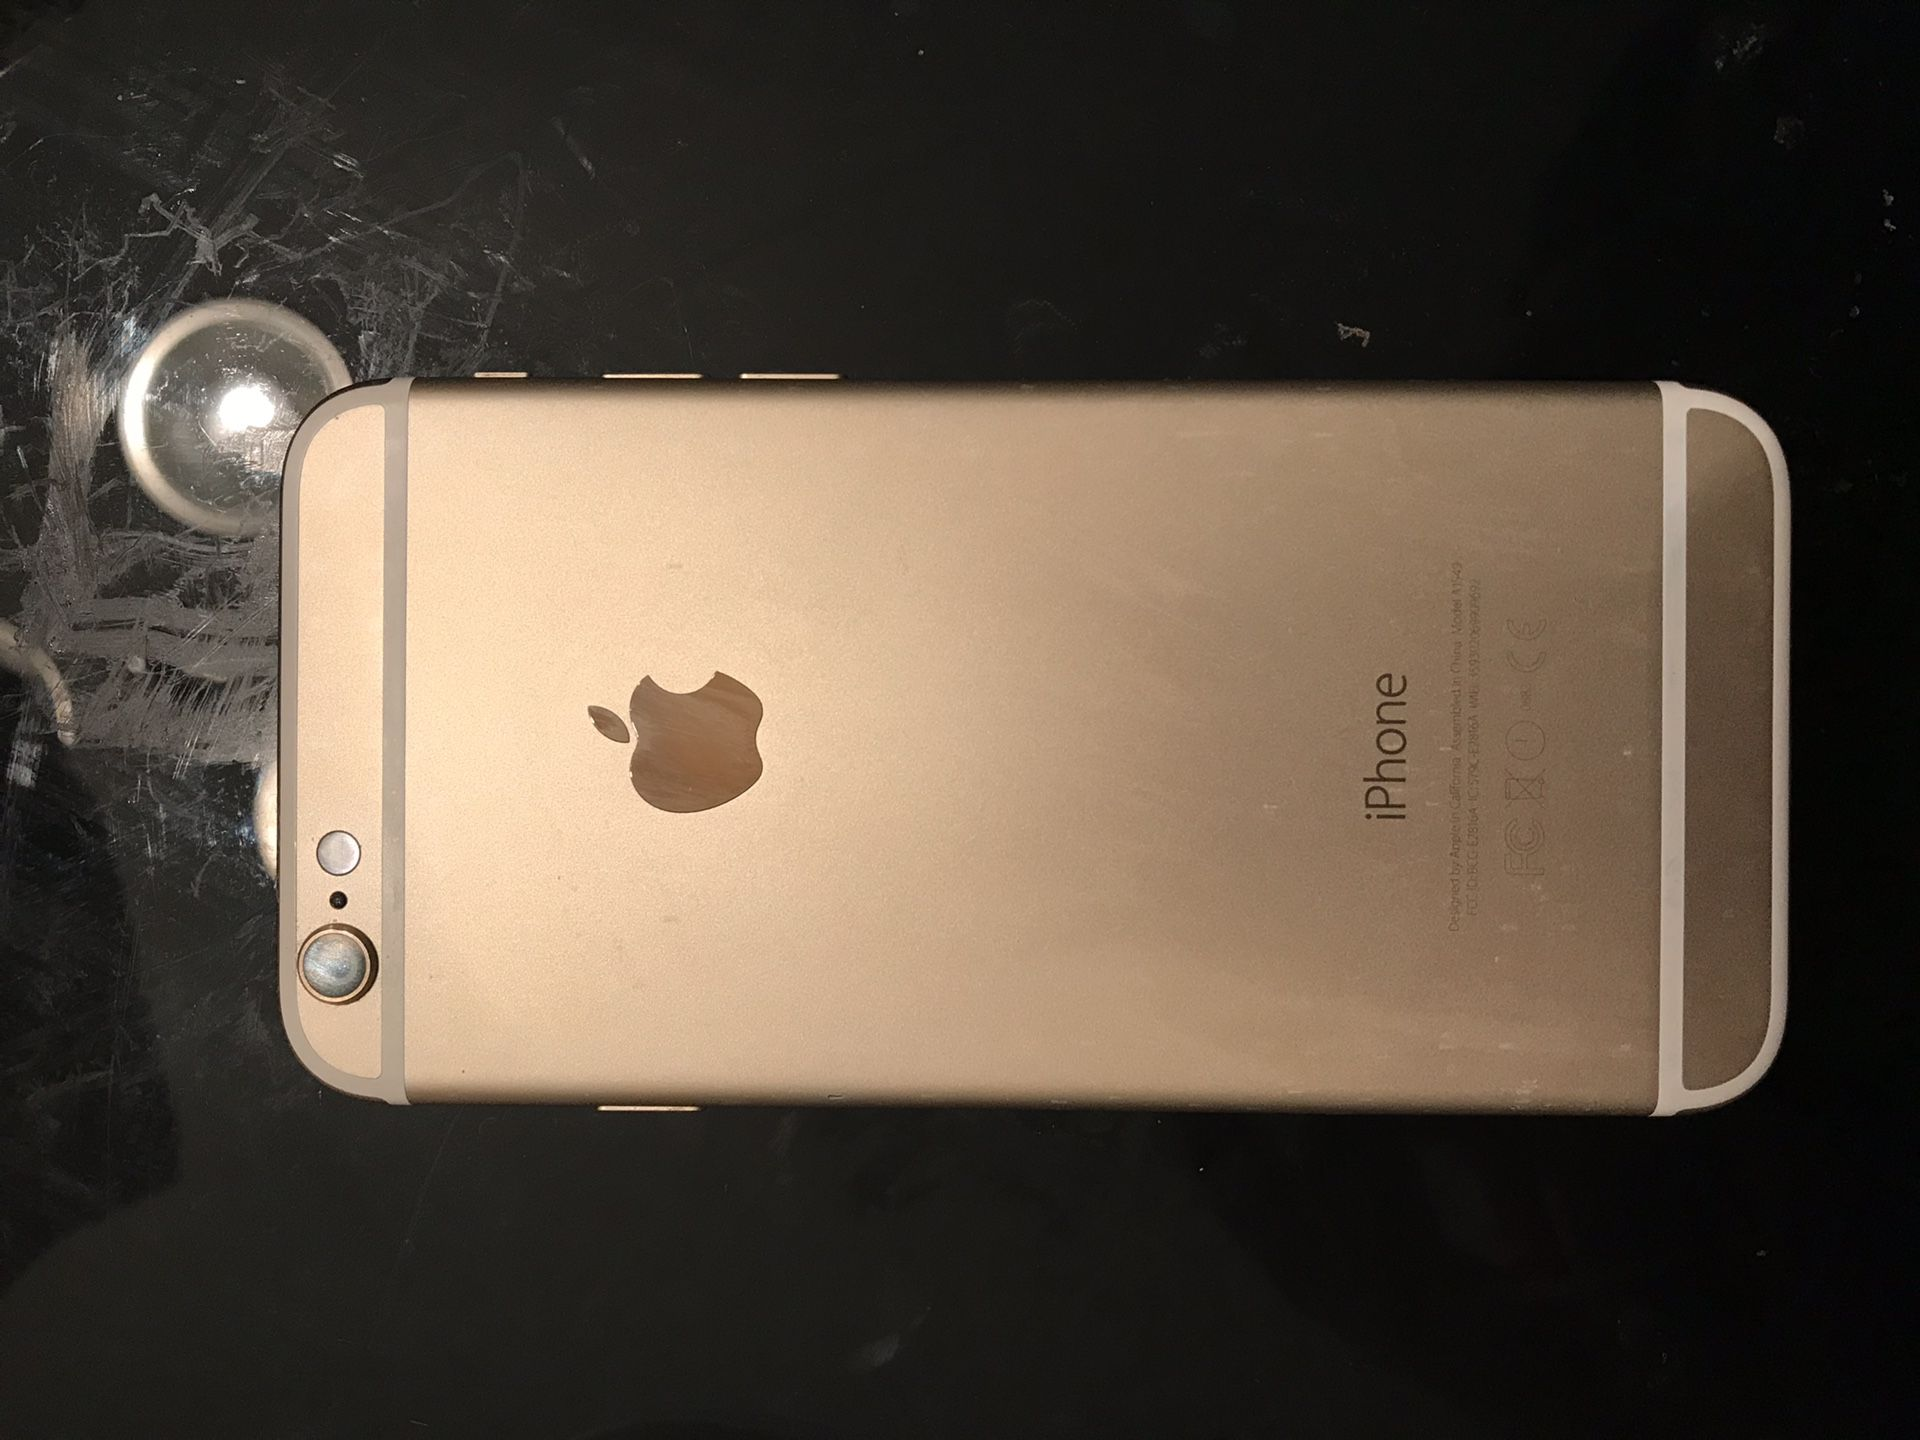 iPhone 6 $125